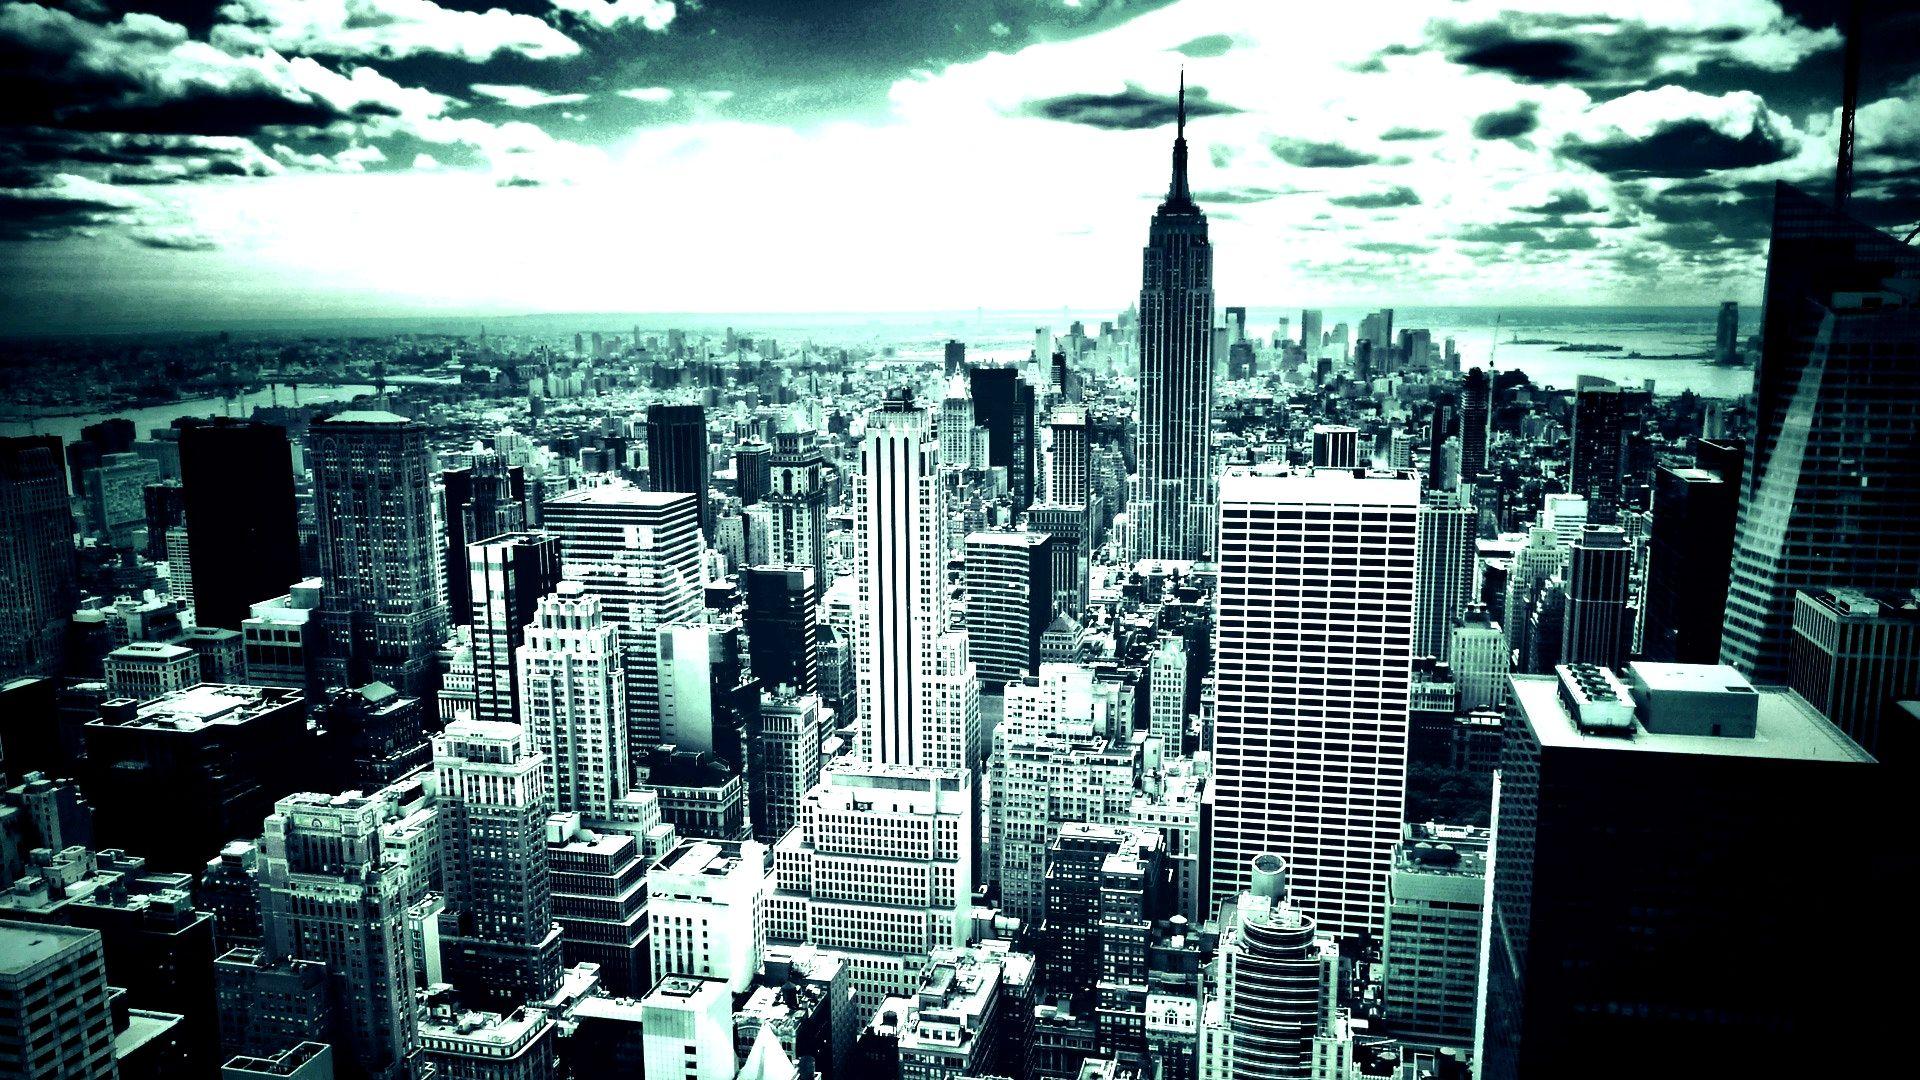 Cityscape New York Wallpaper York Wallpaper City Wallpaper